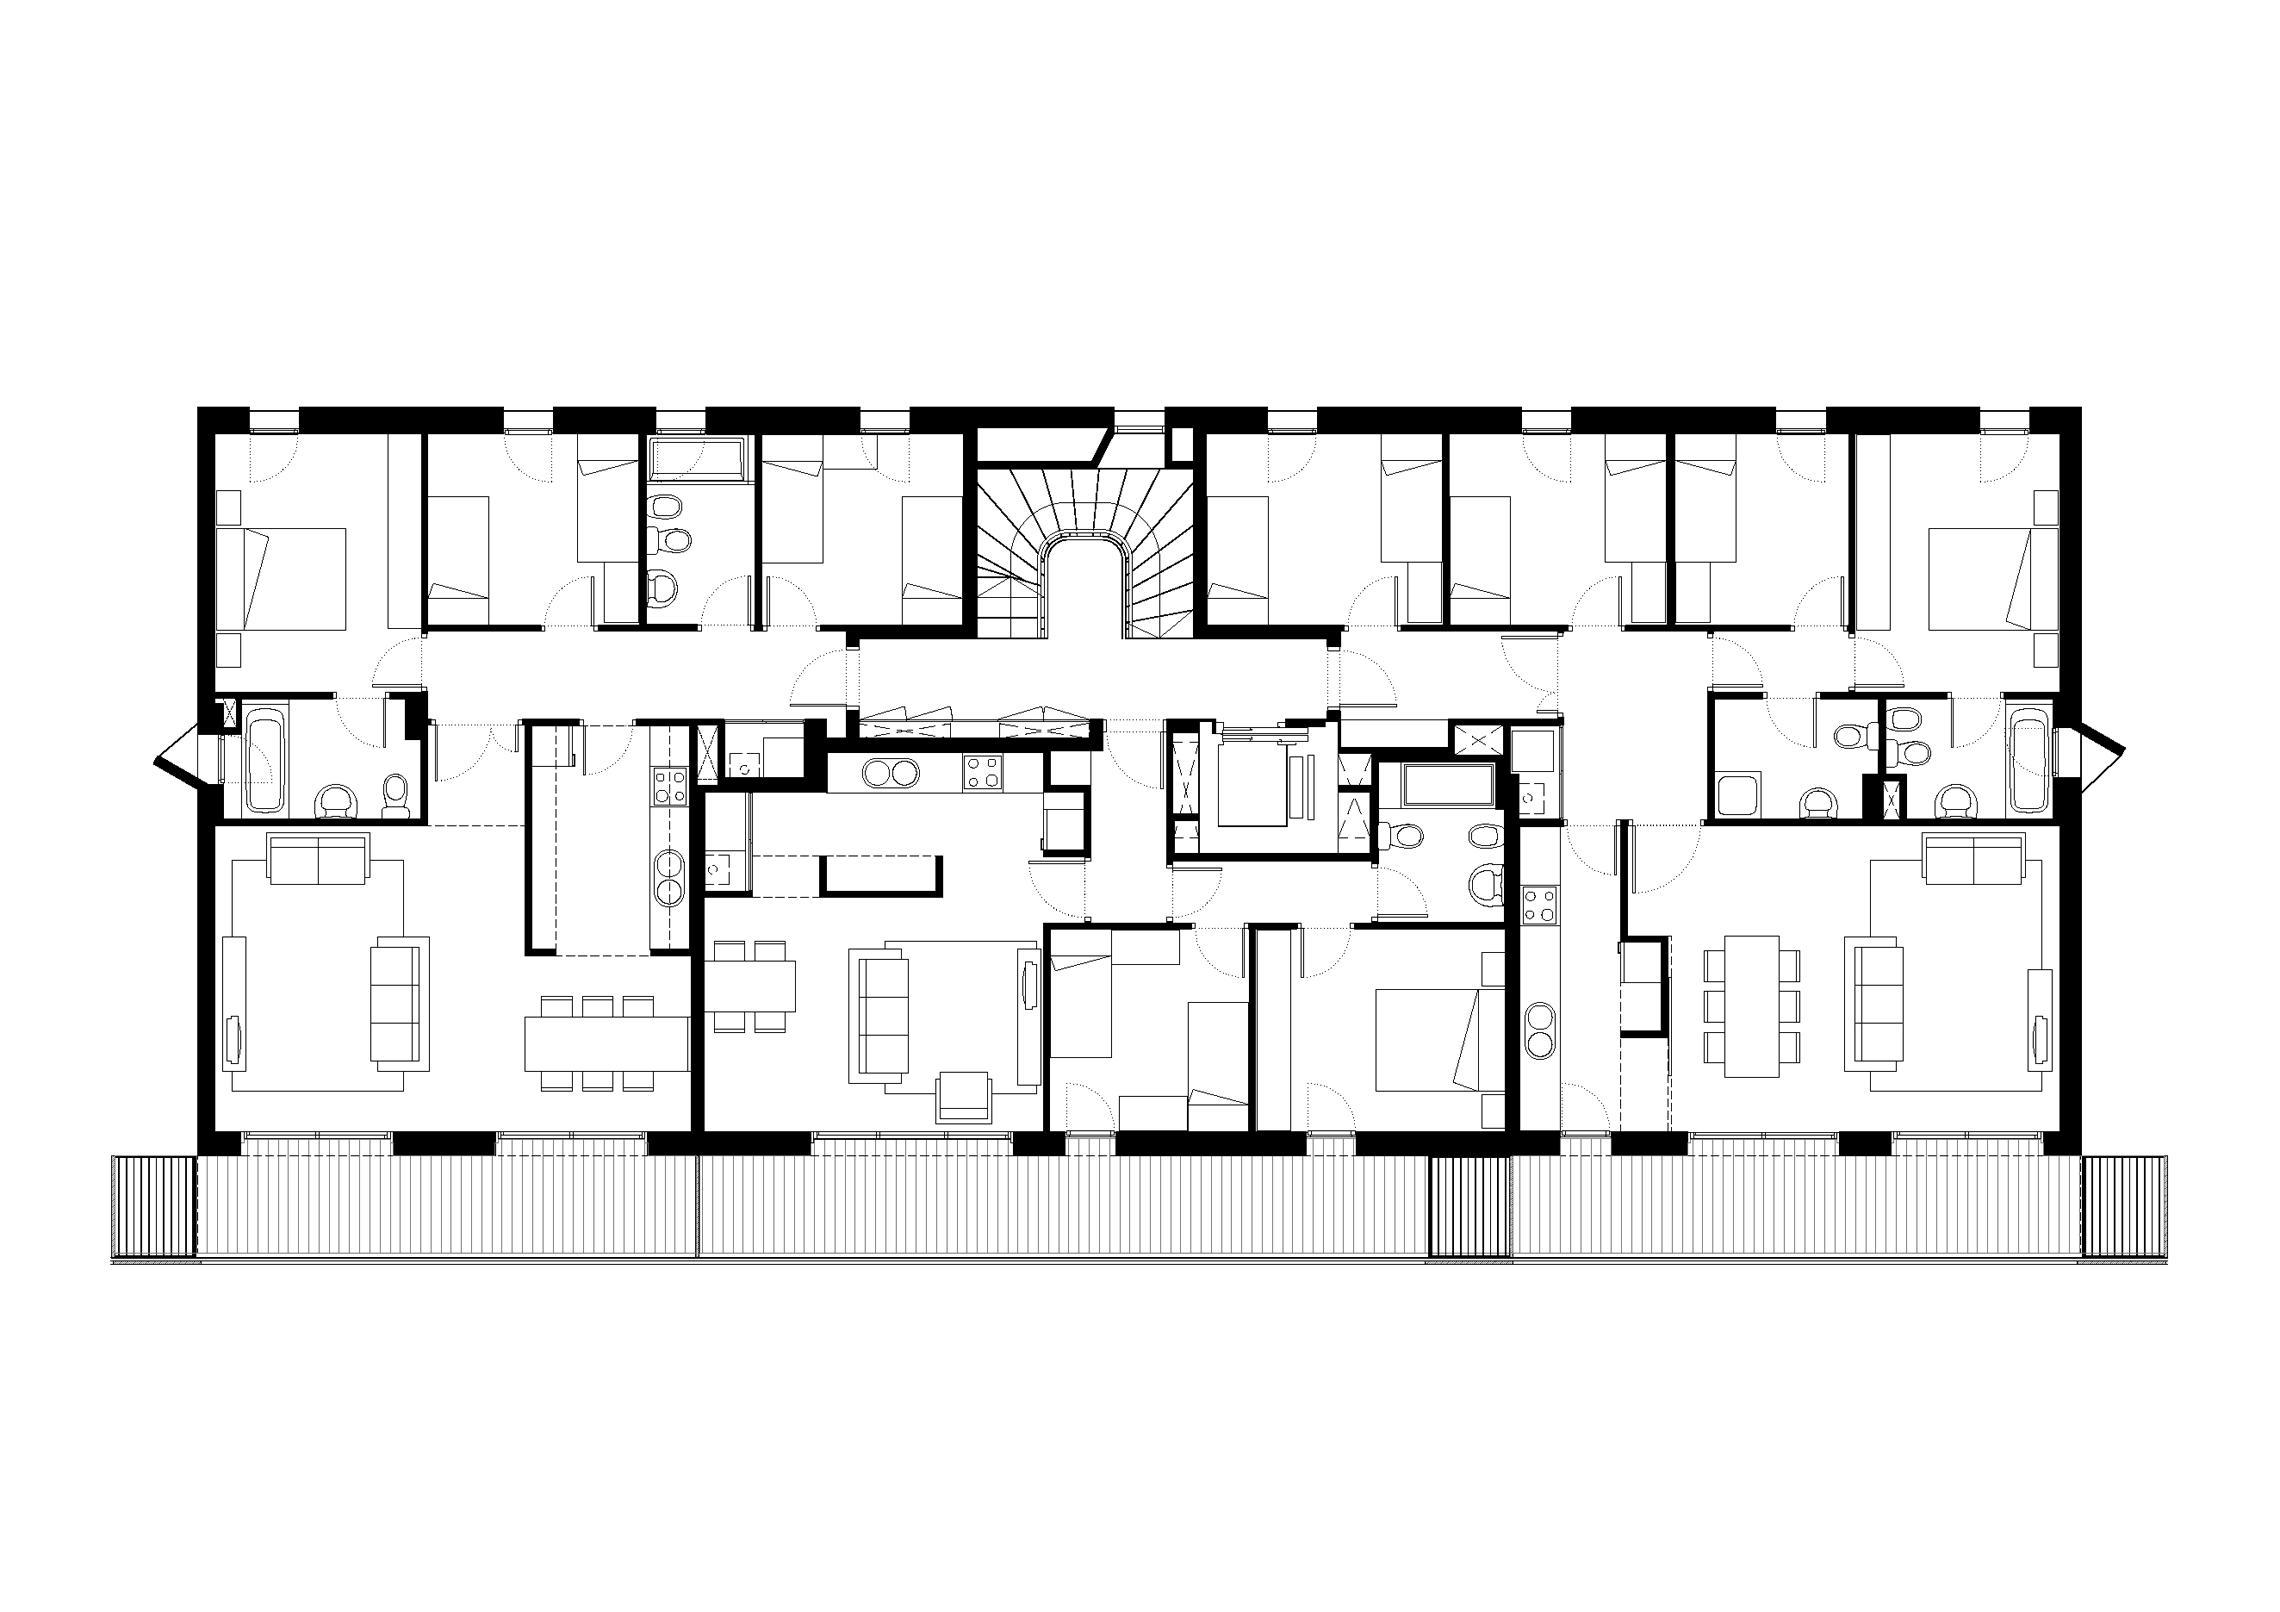 Conjunto Habitacional – Barcelona concursosdeprojeto.org #666666 2280 1612